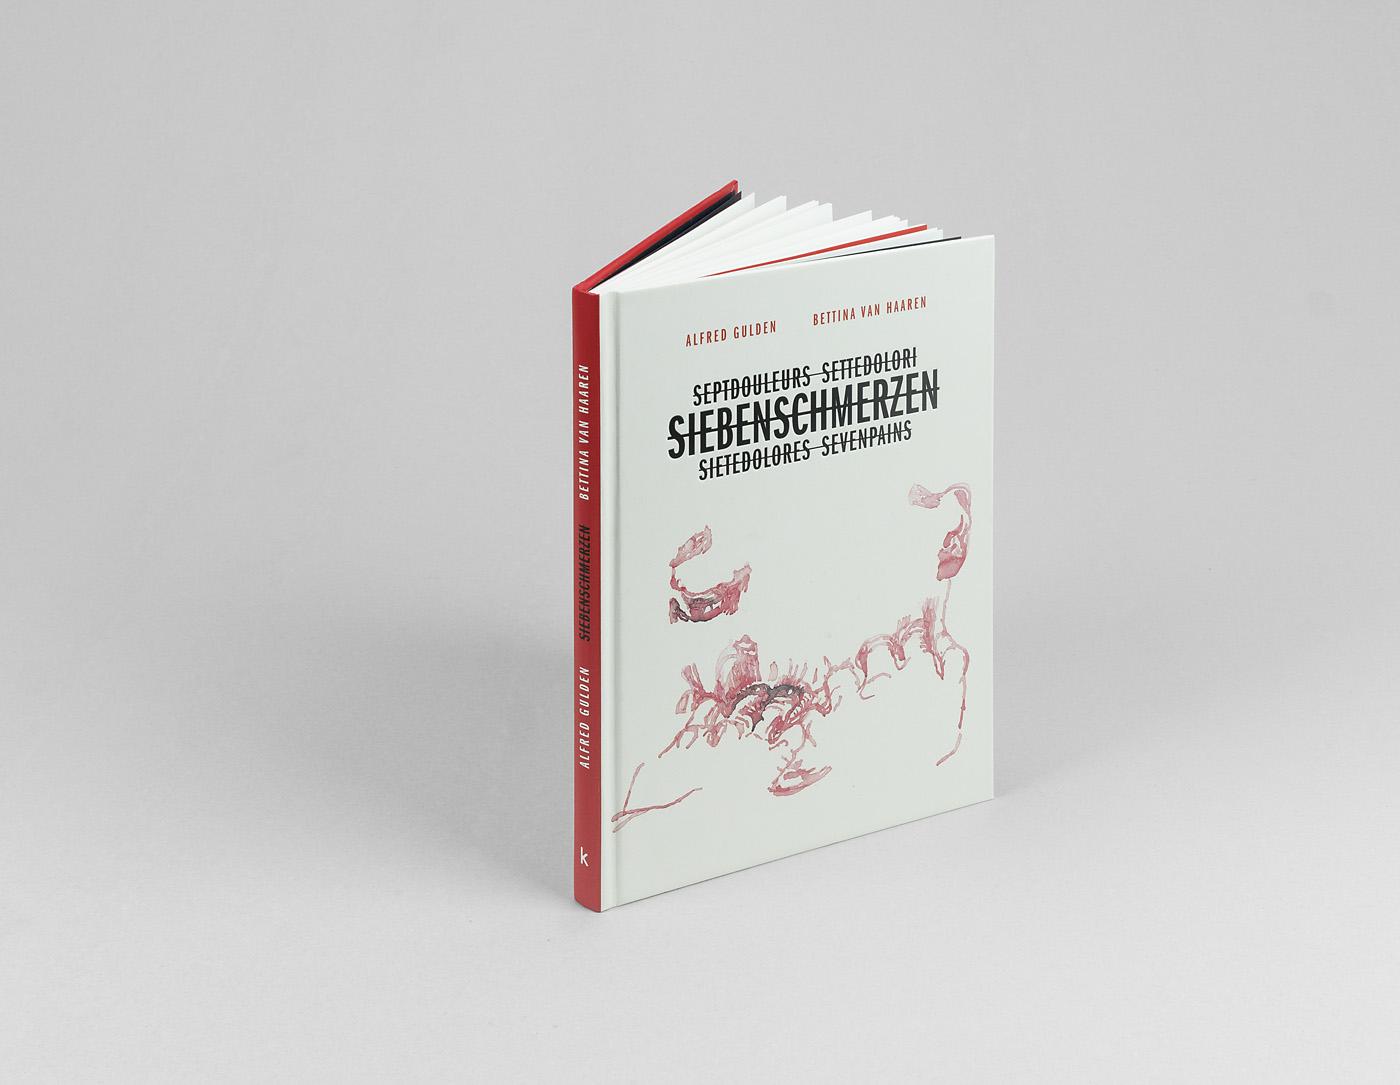 ksp_bvh_siebens_cover